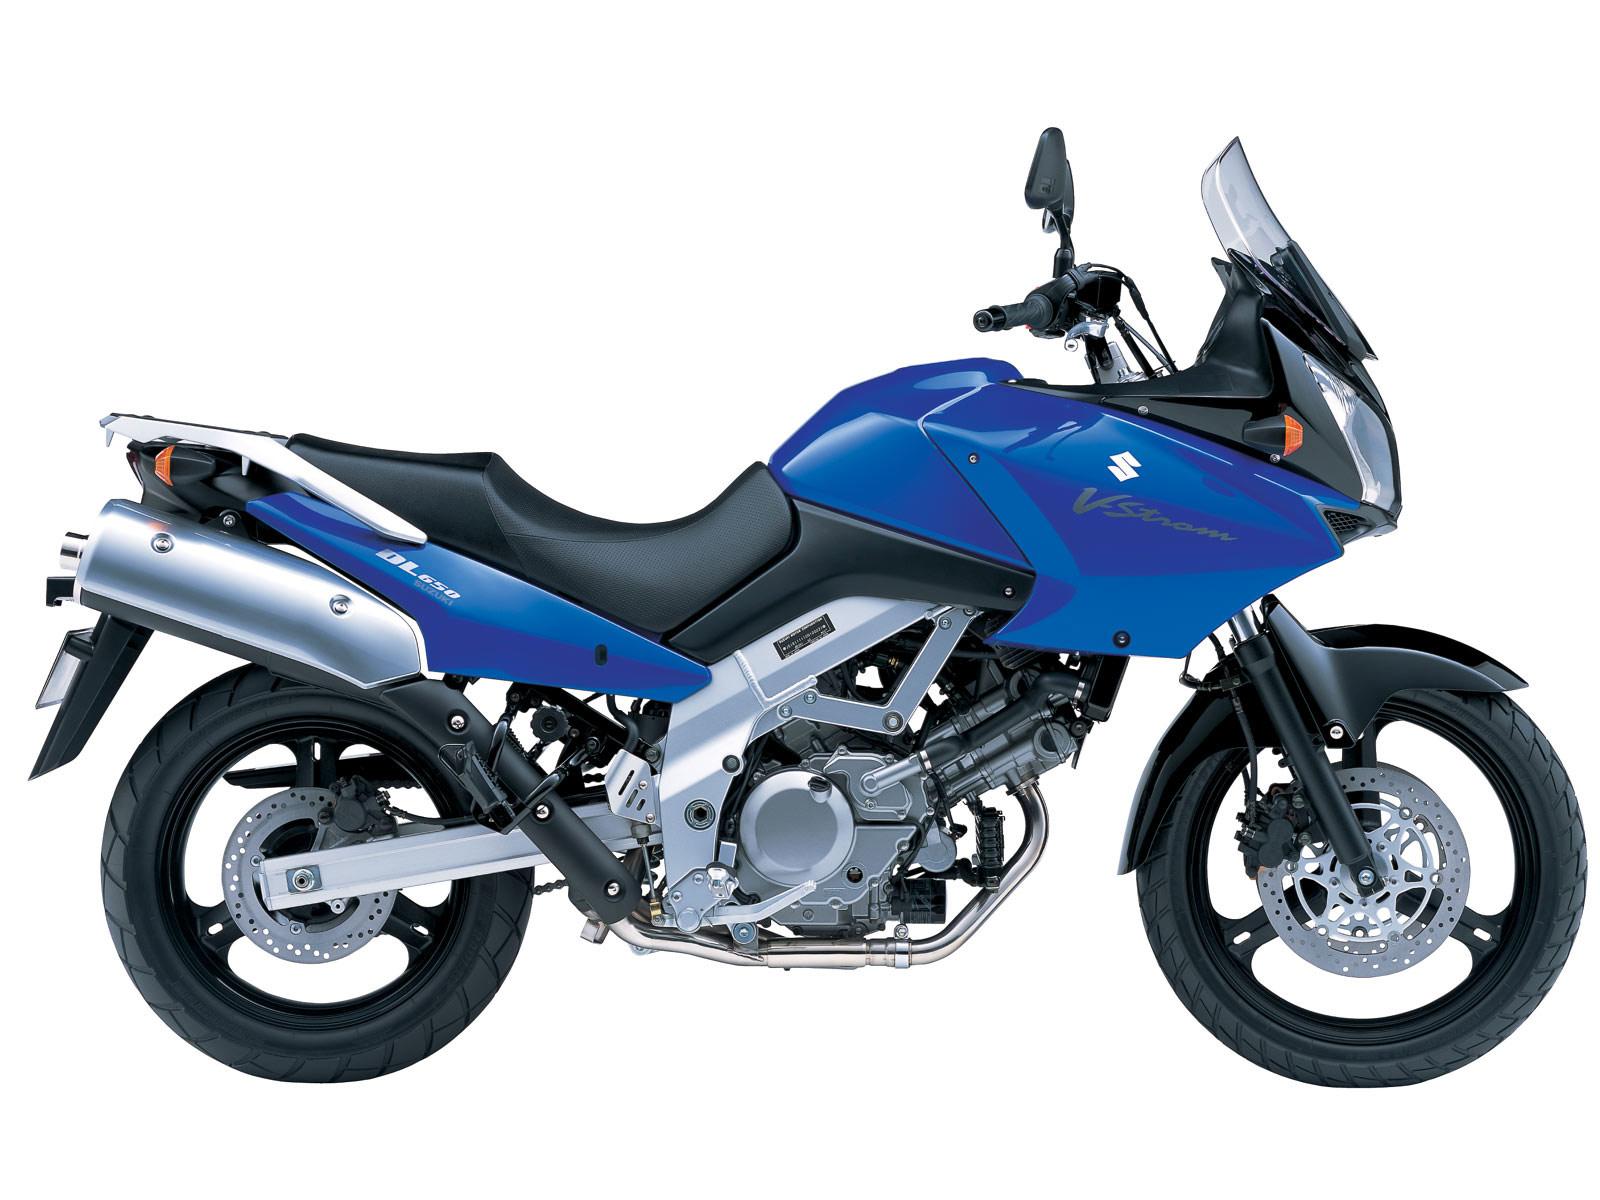 Auto Trader Suzuki V Strom 650 2004 Specs And Pictures